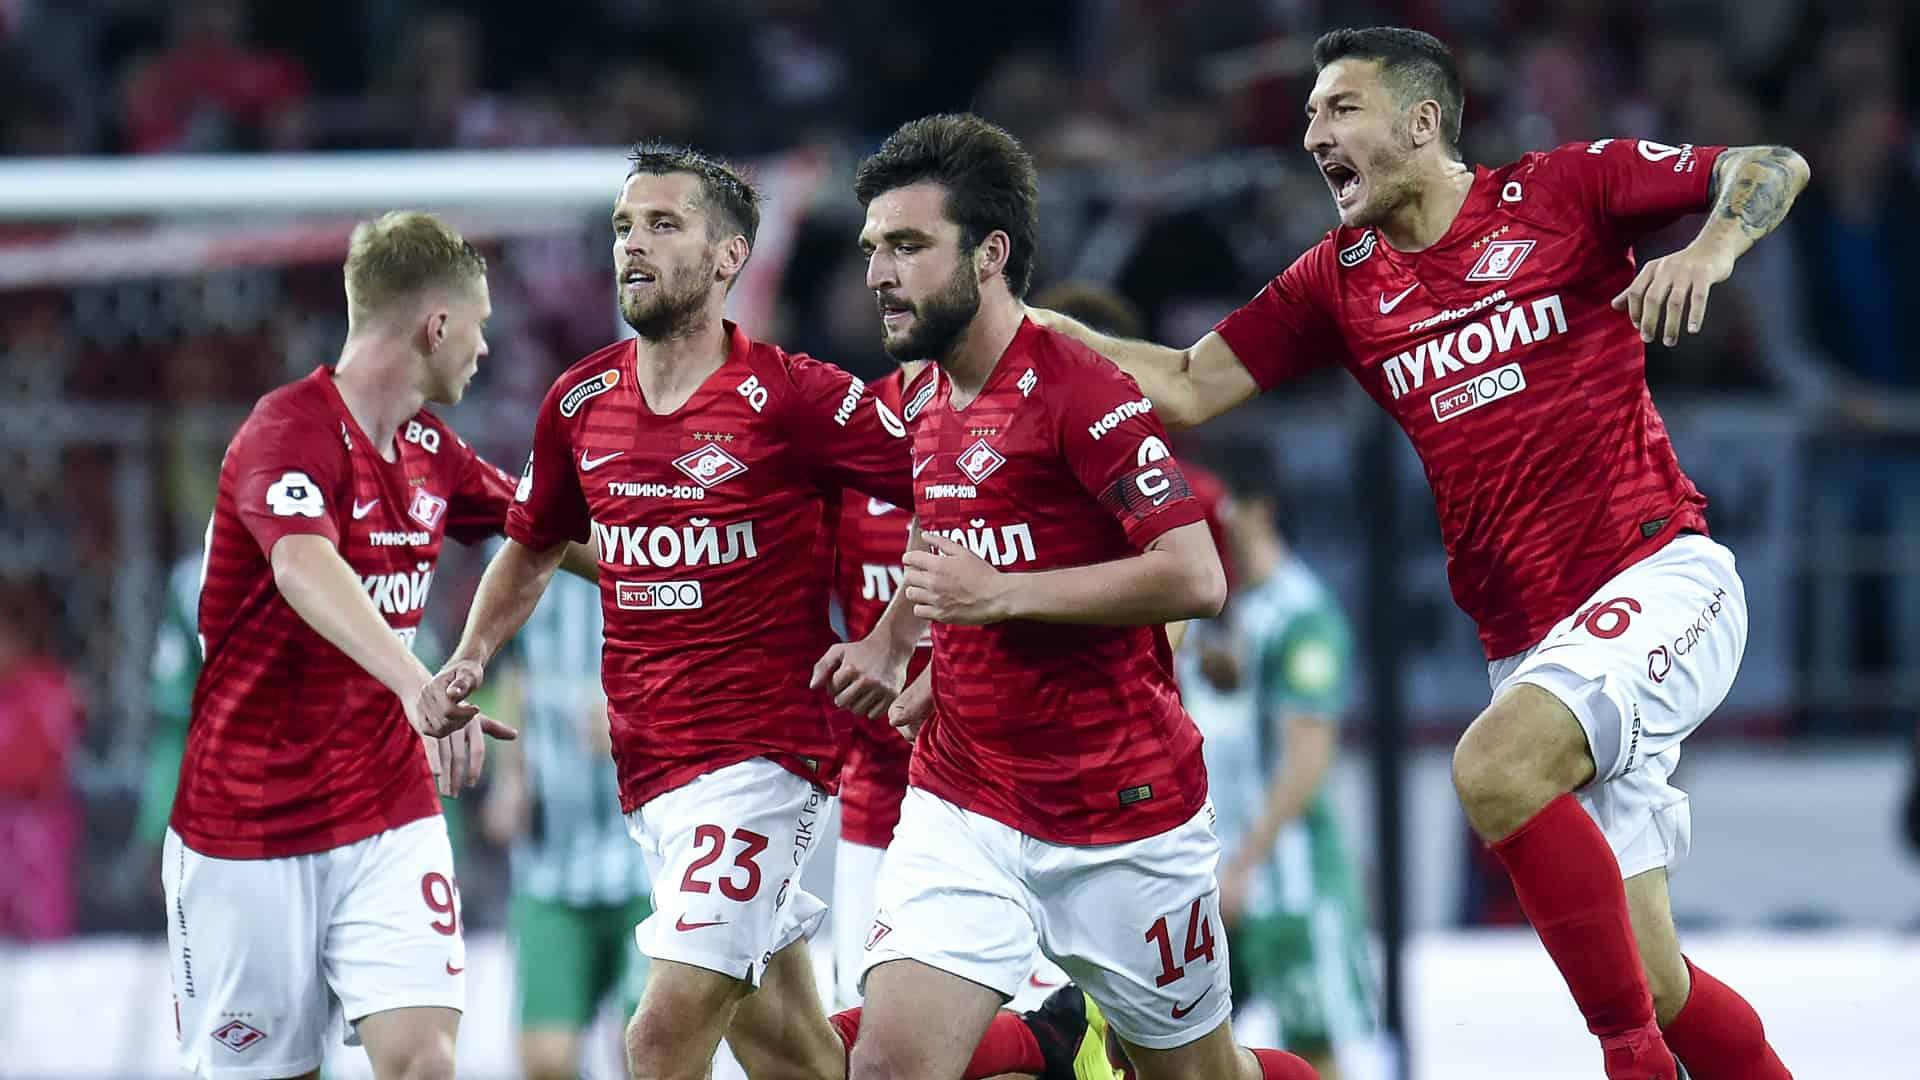 Spartak Moskwa fc team